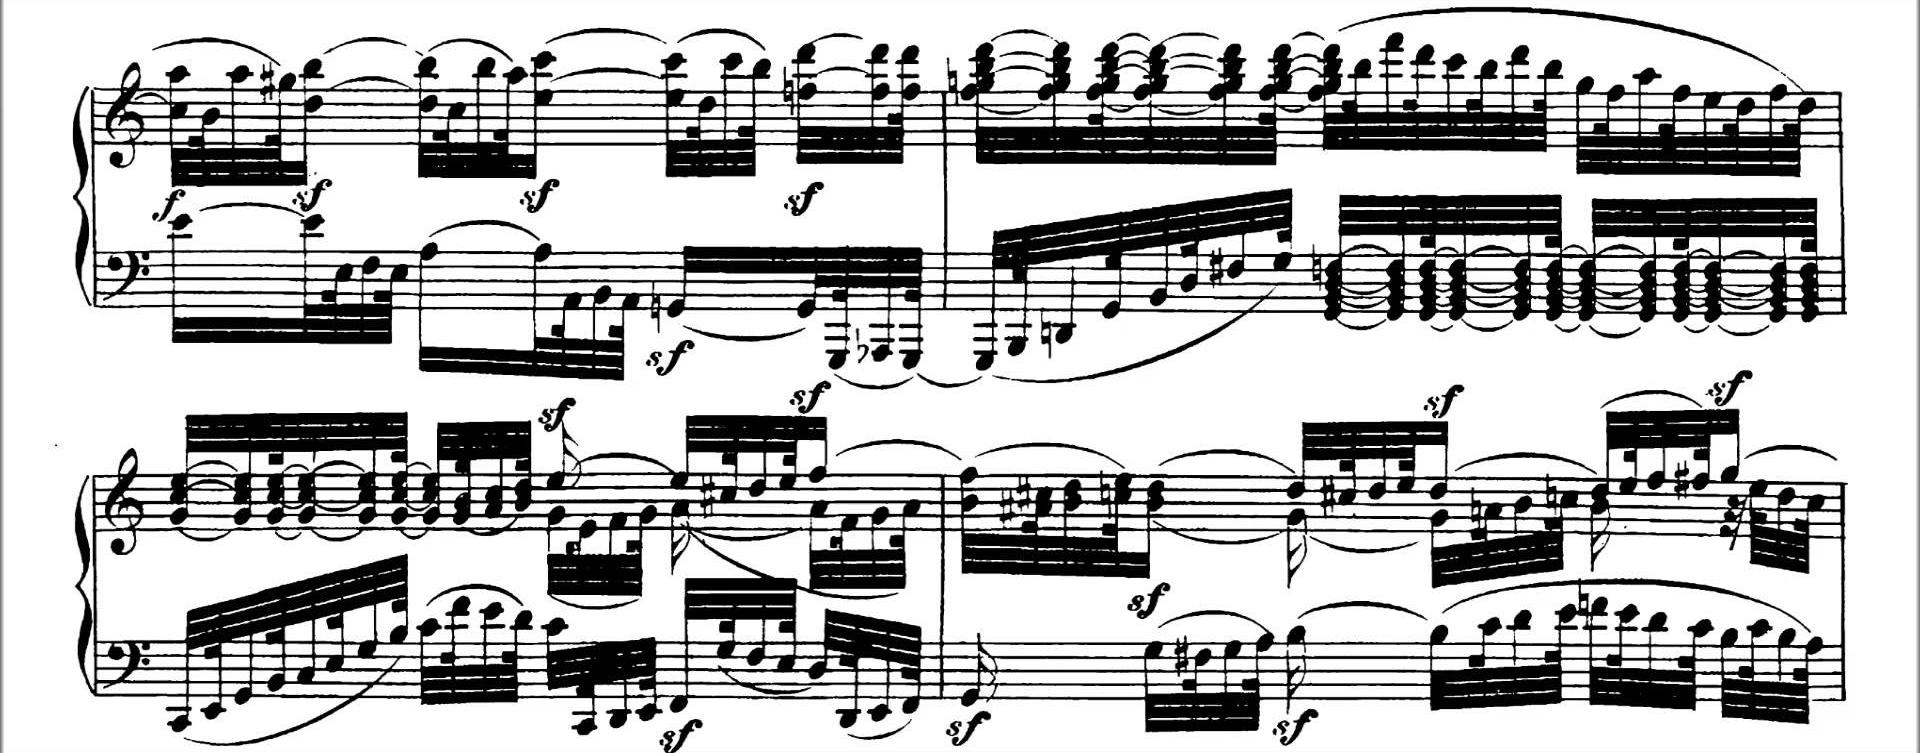 sheet music.jpg